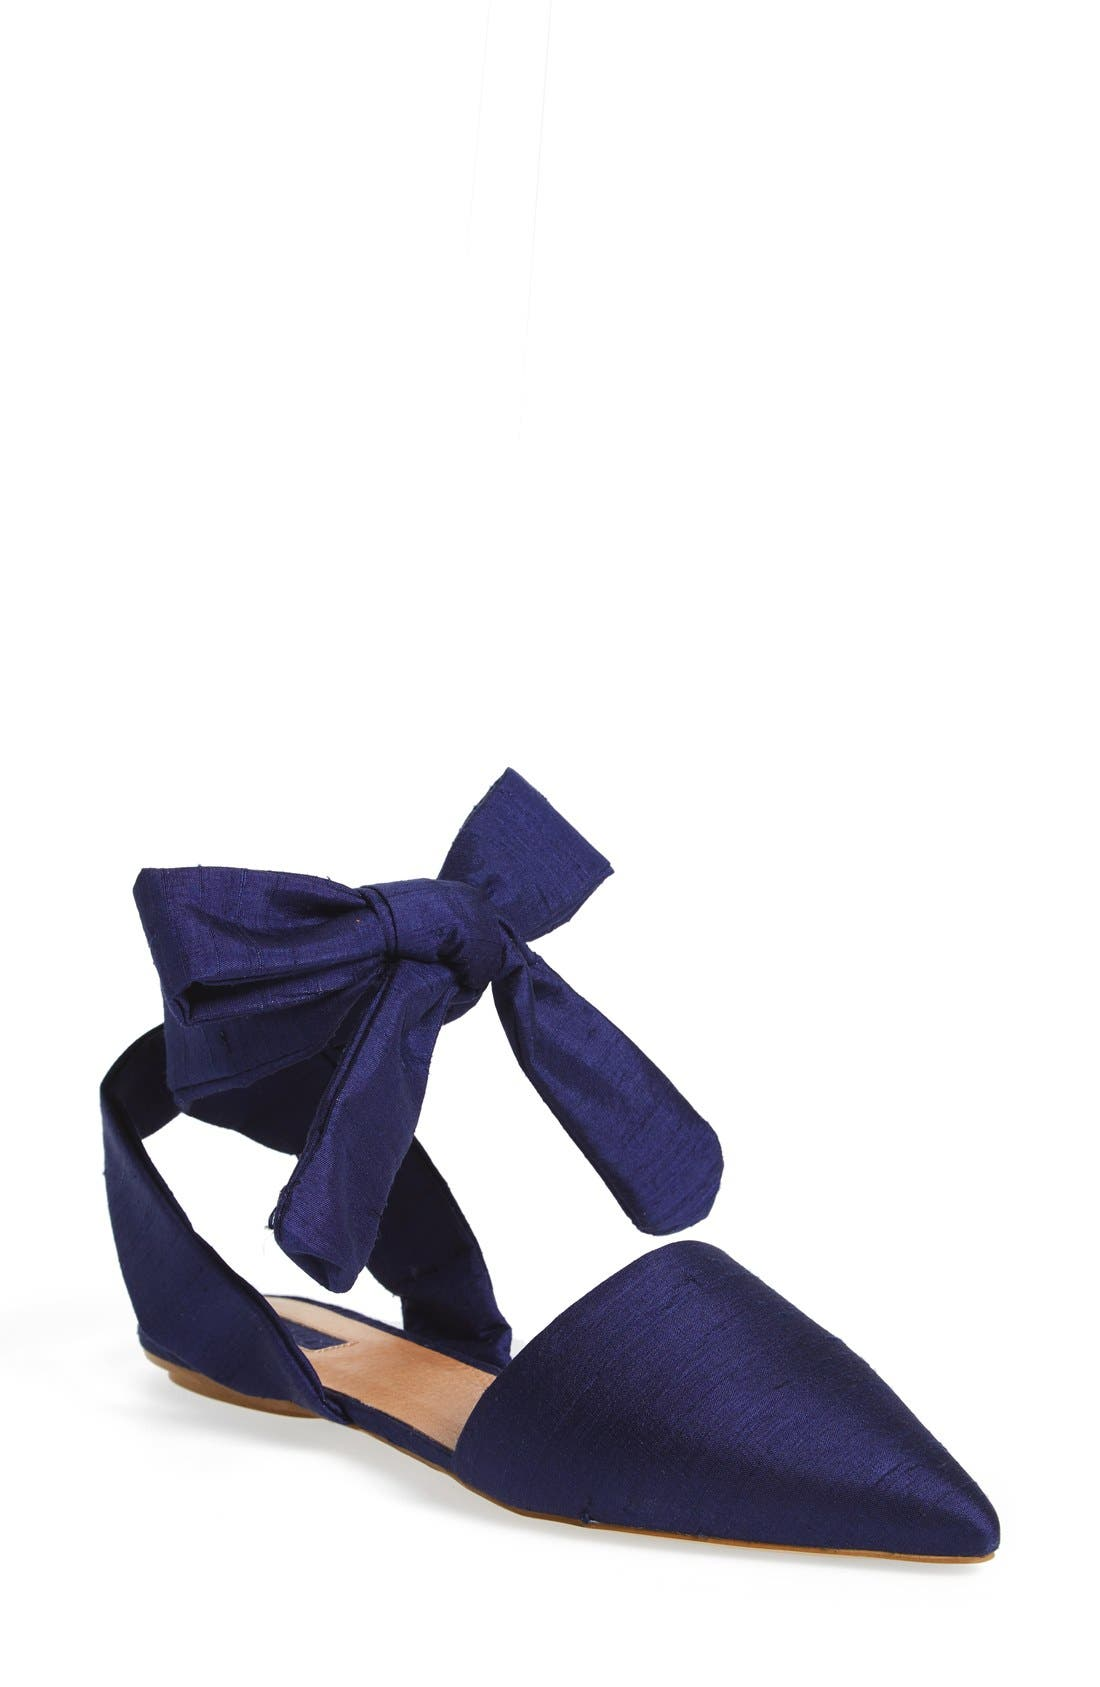 Main Image - Topshop 'Khloe' Pointy Toe Flat (Women)